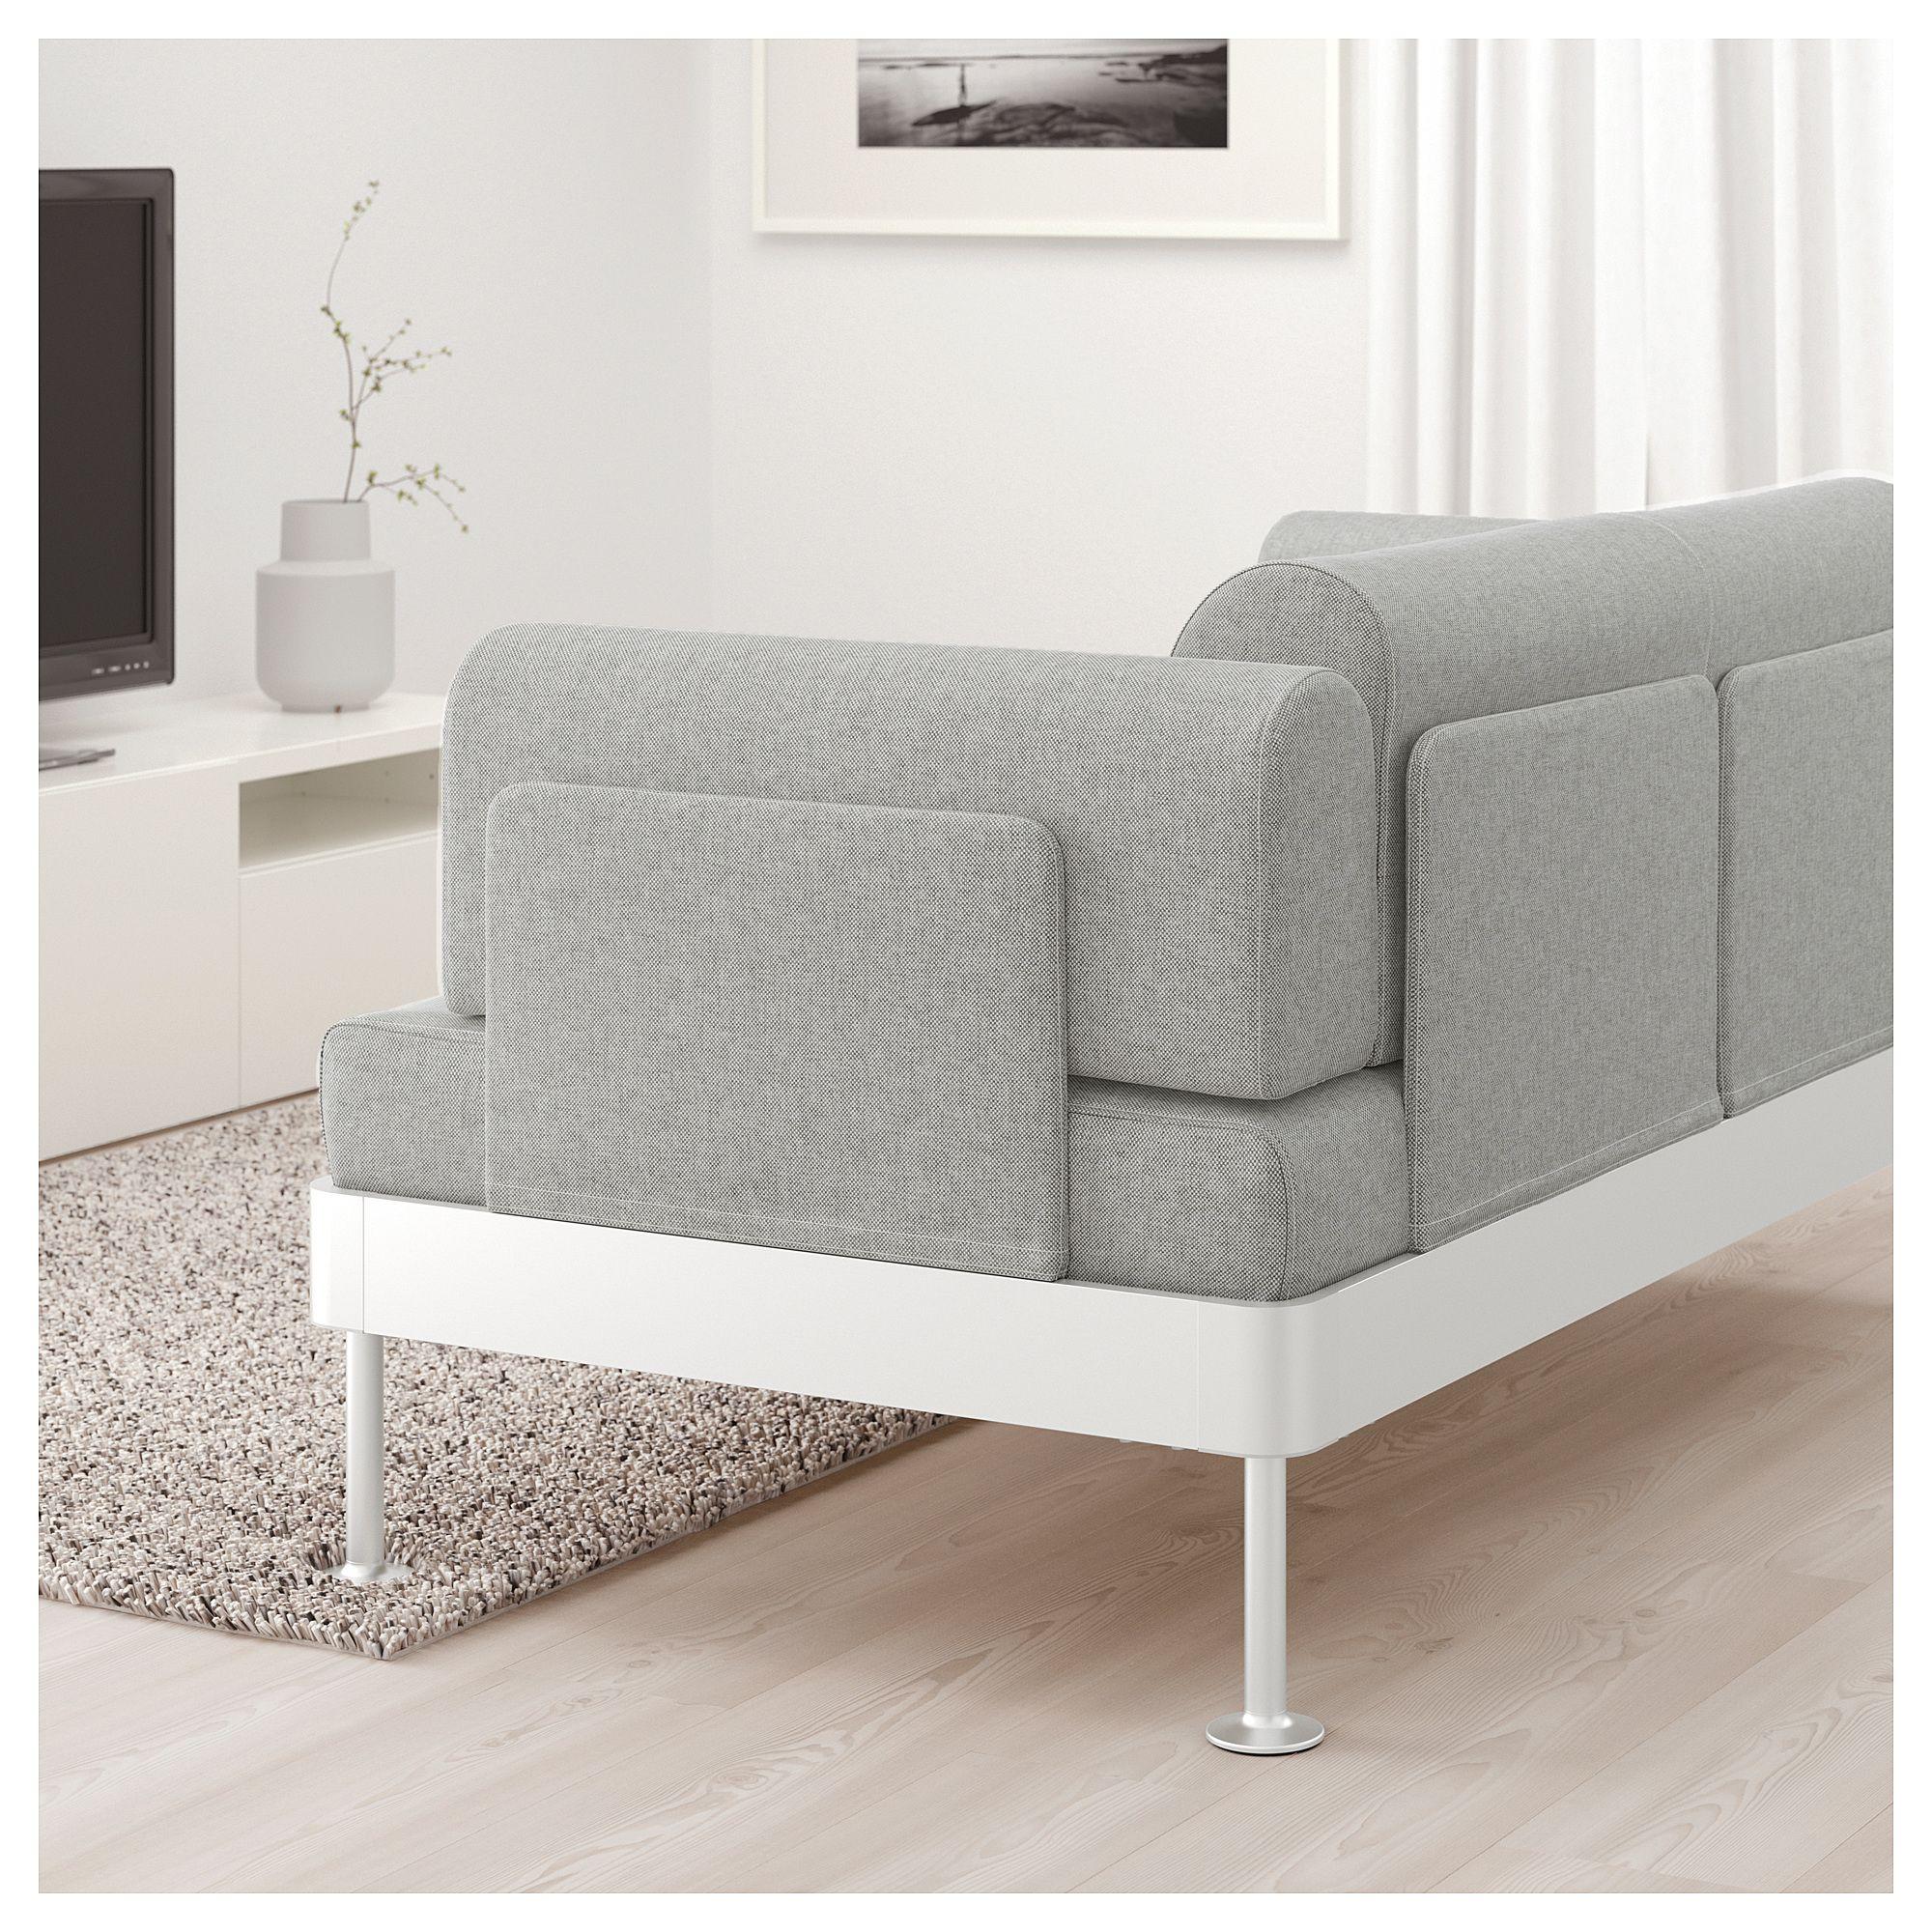 Delaktig 2er Sofa Tallmyra Weiss Schwarz Ikea Osterreich 2er Sofa 3er Sofa Und Kissen Sofa